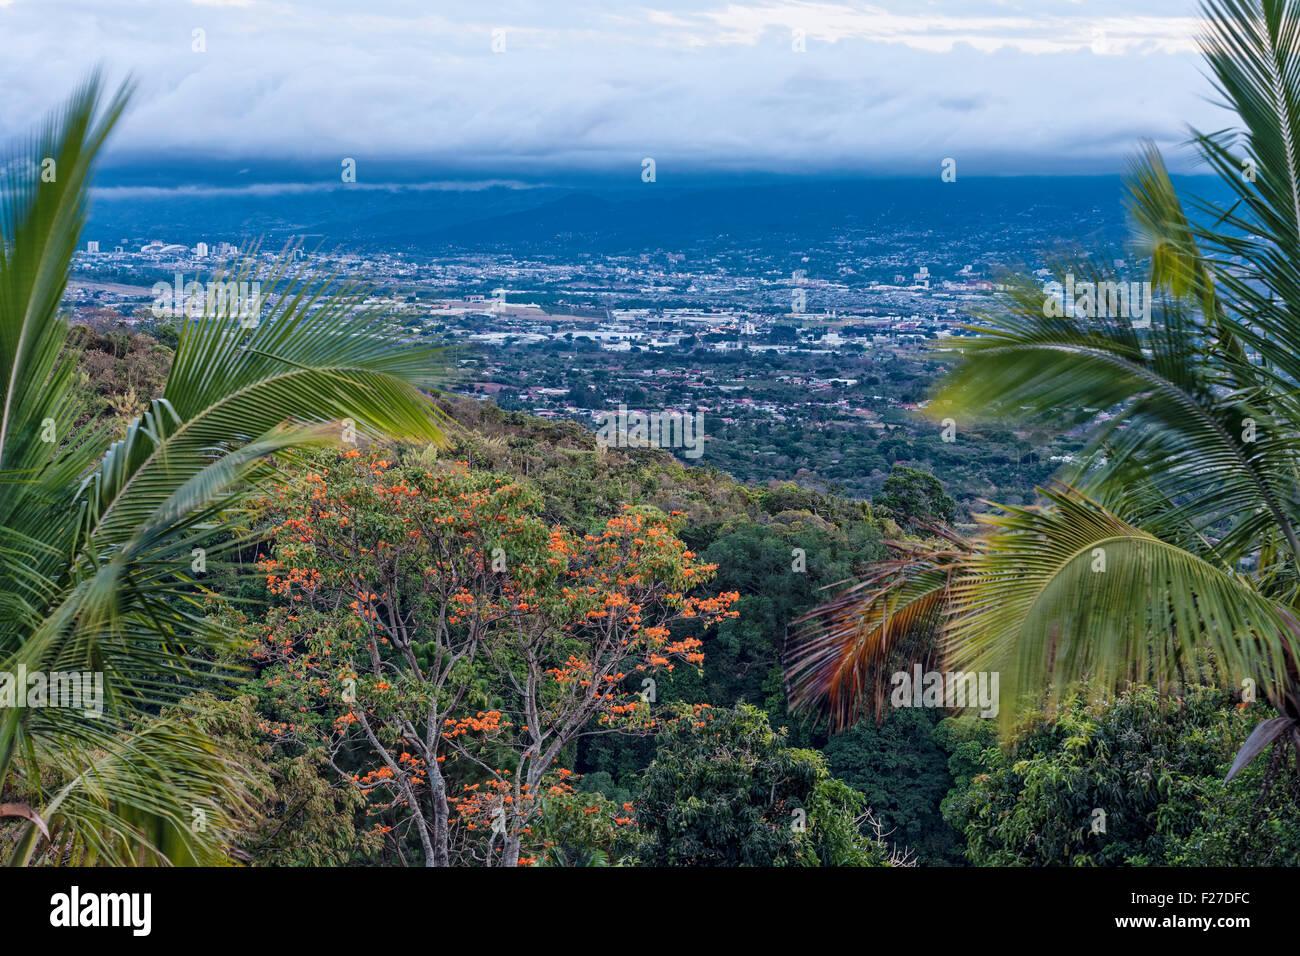 San Jose, Costa Rica Photo Stock